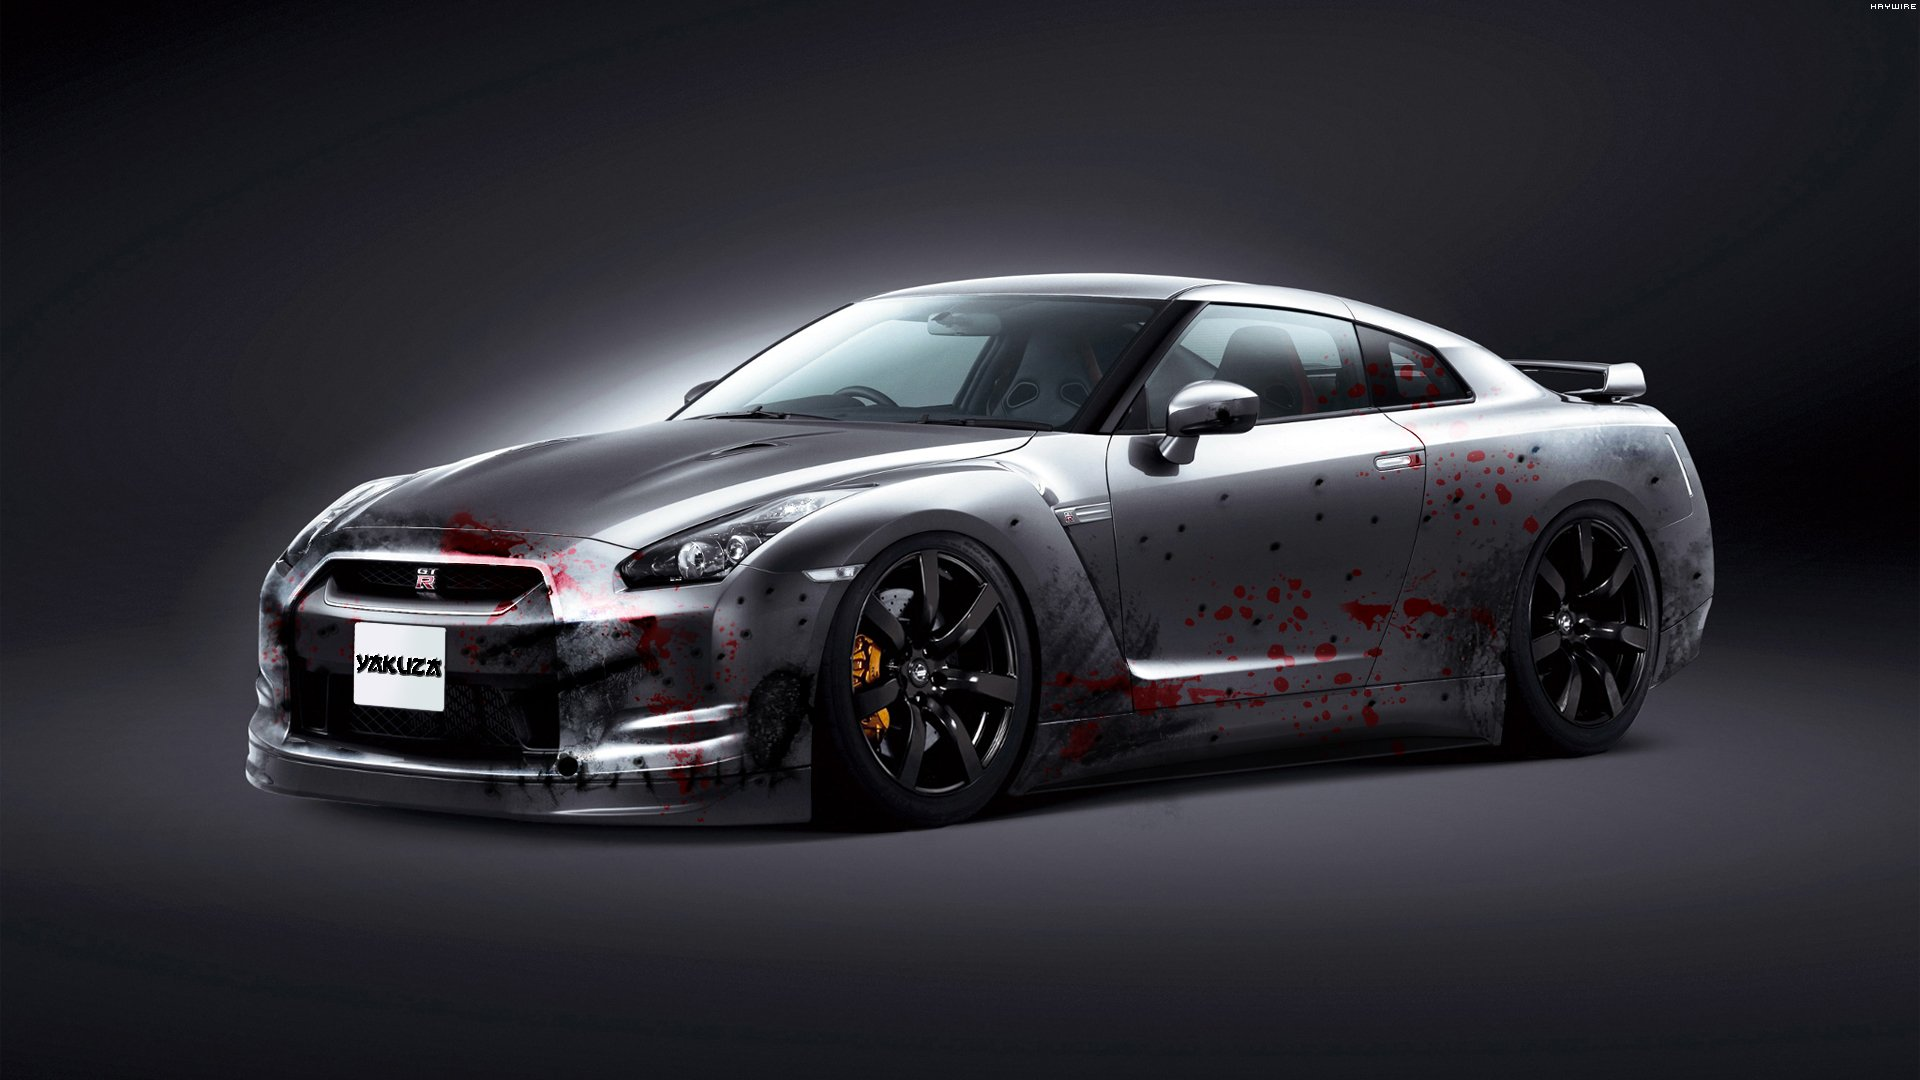 Nissan GTR Black Edition 08 wallpaper 1920x1080 565828 1920x1080